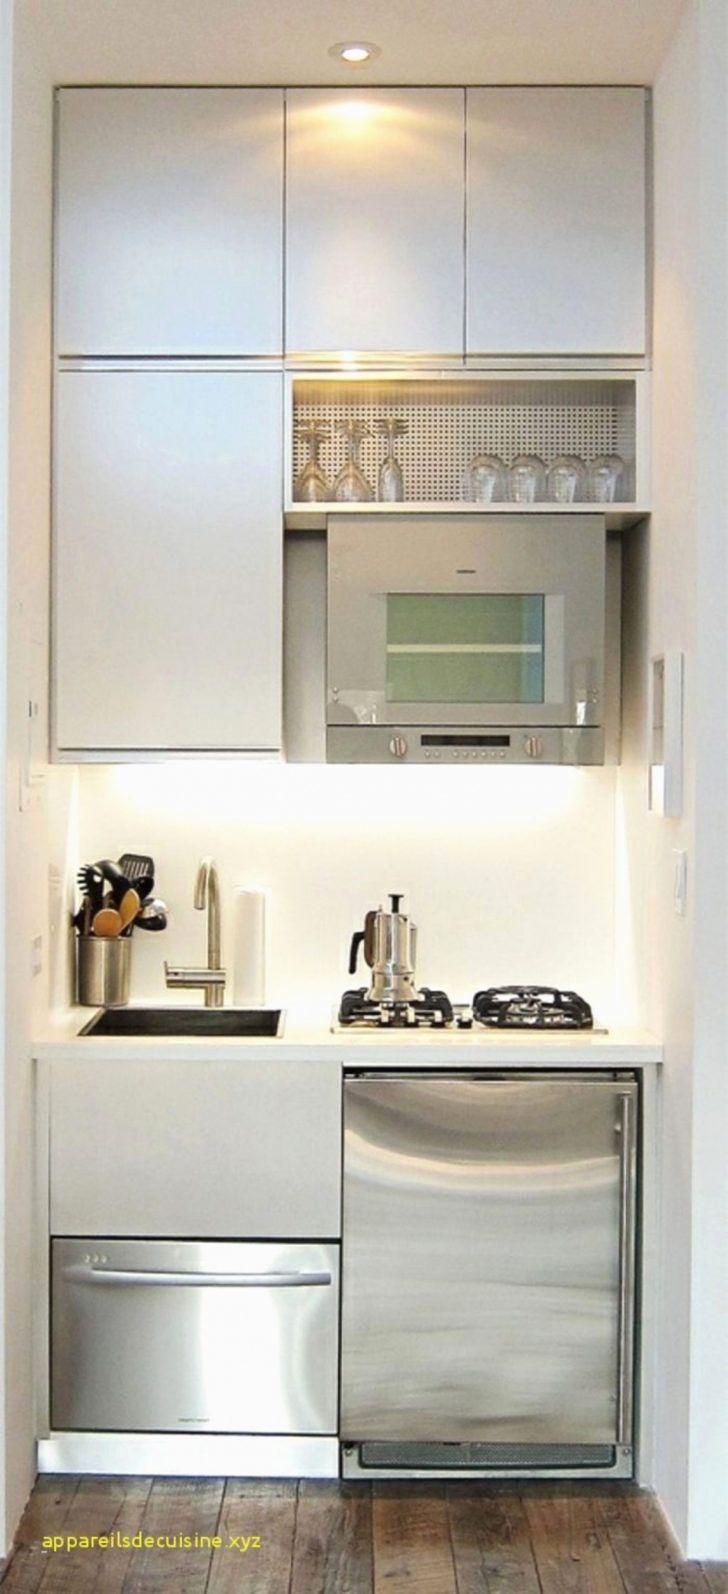 Interior Design:meubles Chinois Design Meuble Destock destiné Destock Meubles Chinois